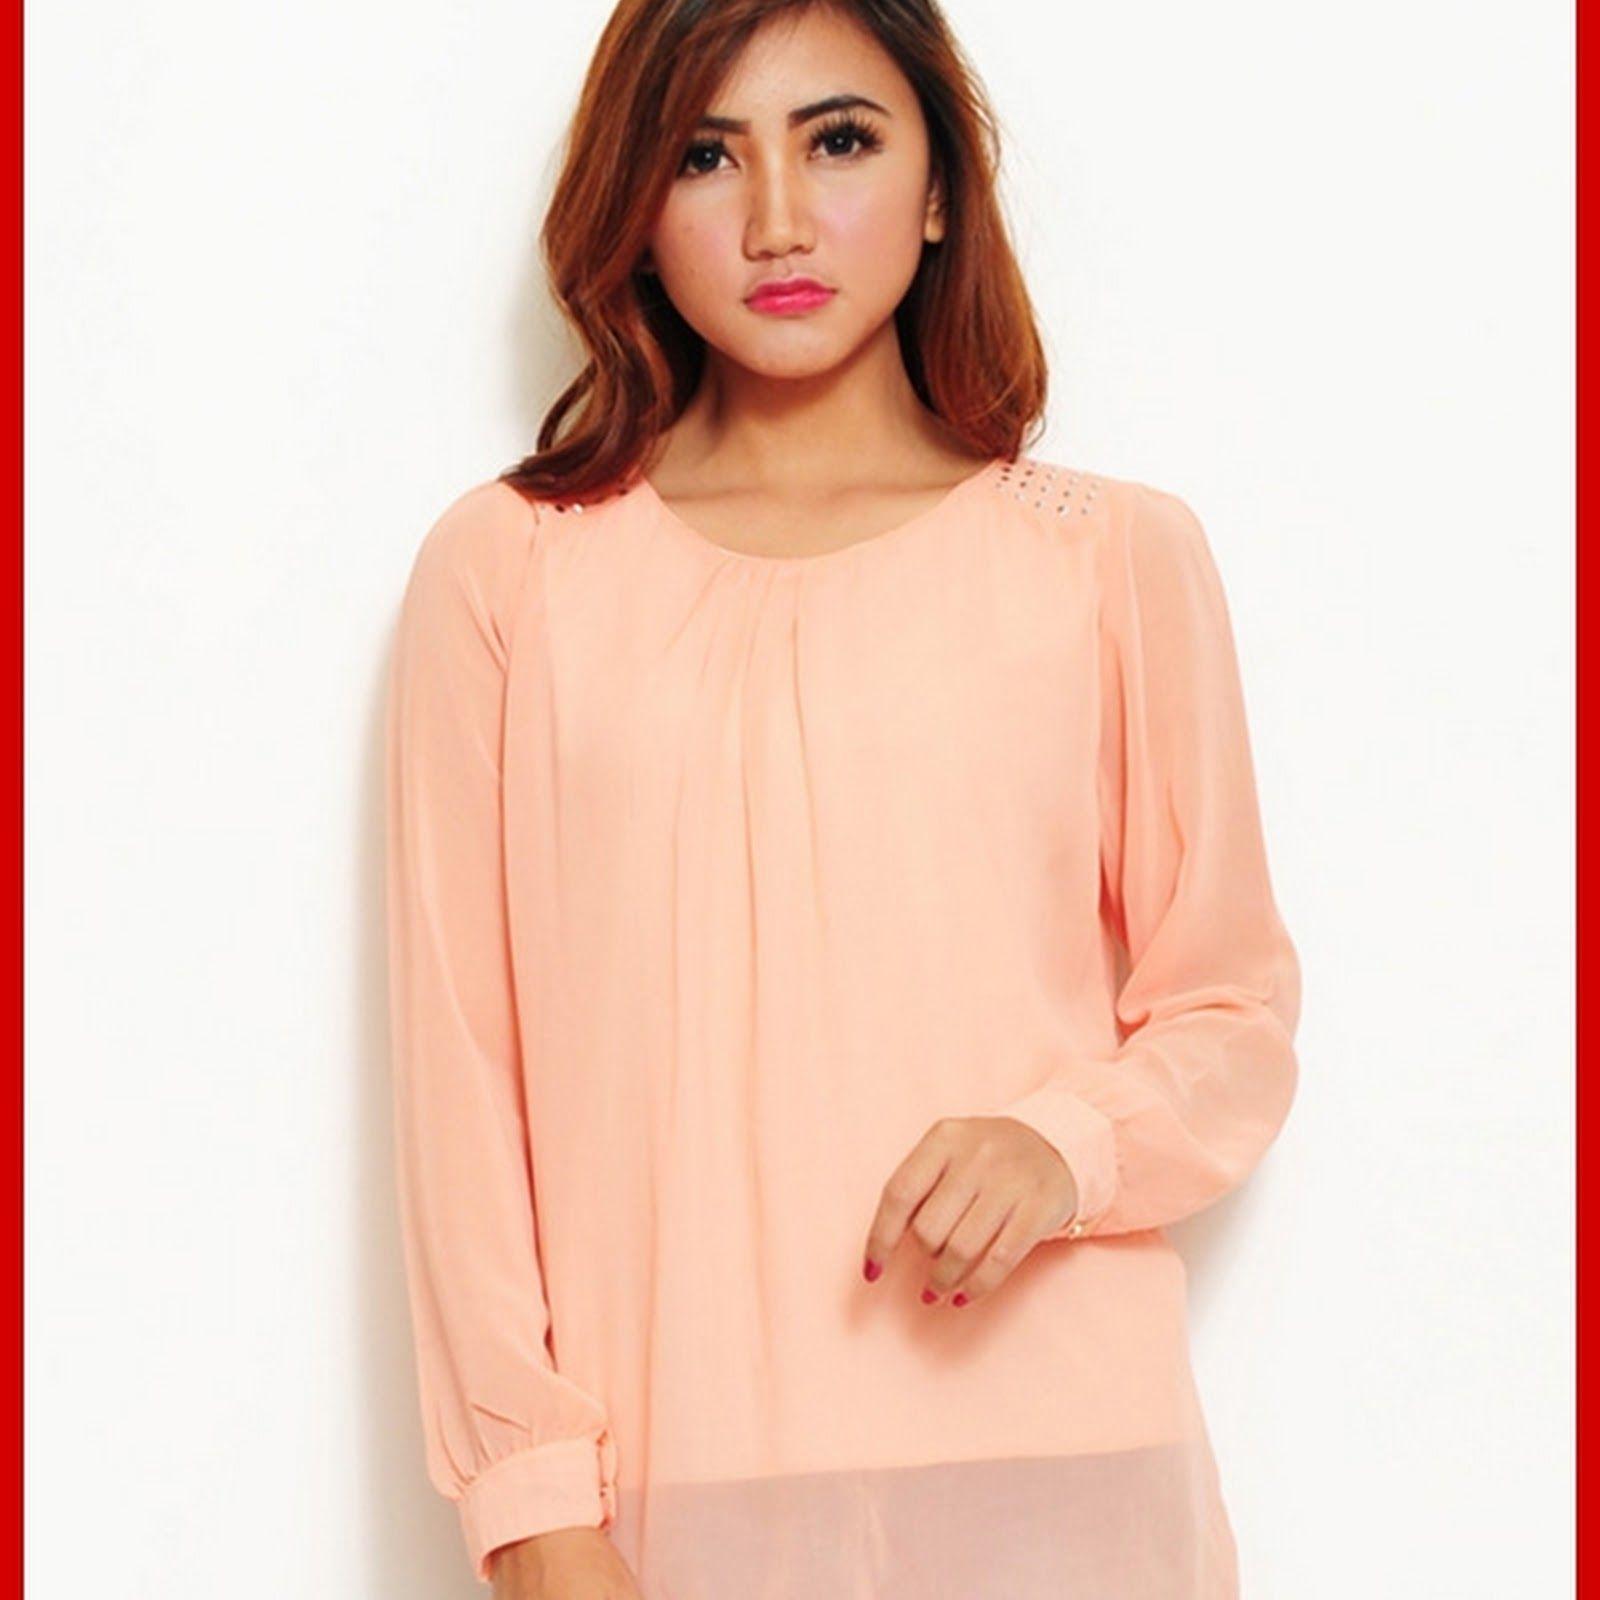 Atasan Wanita Terbaru Model e1ock fashion transparan kaos peach BMGShop